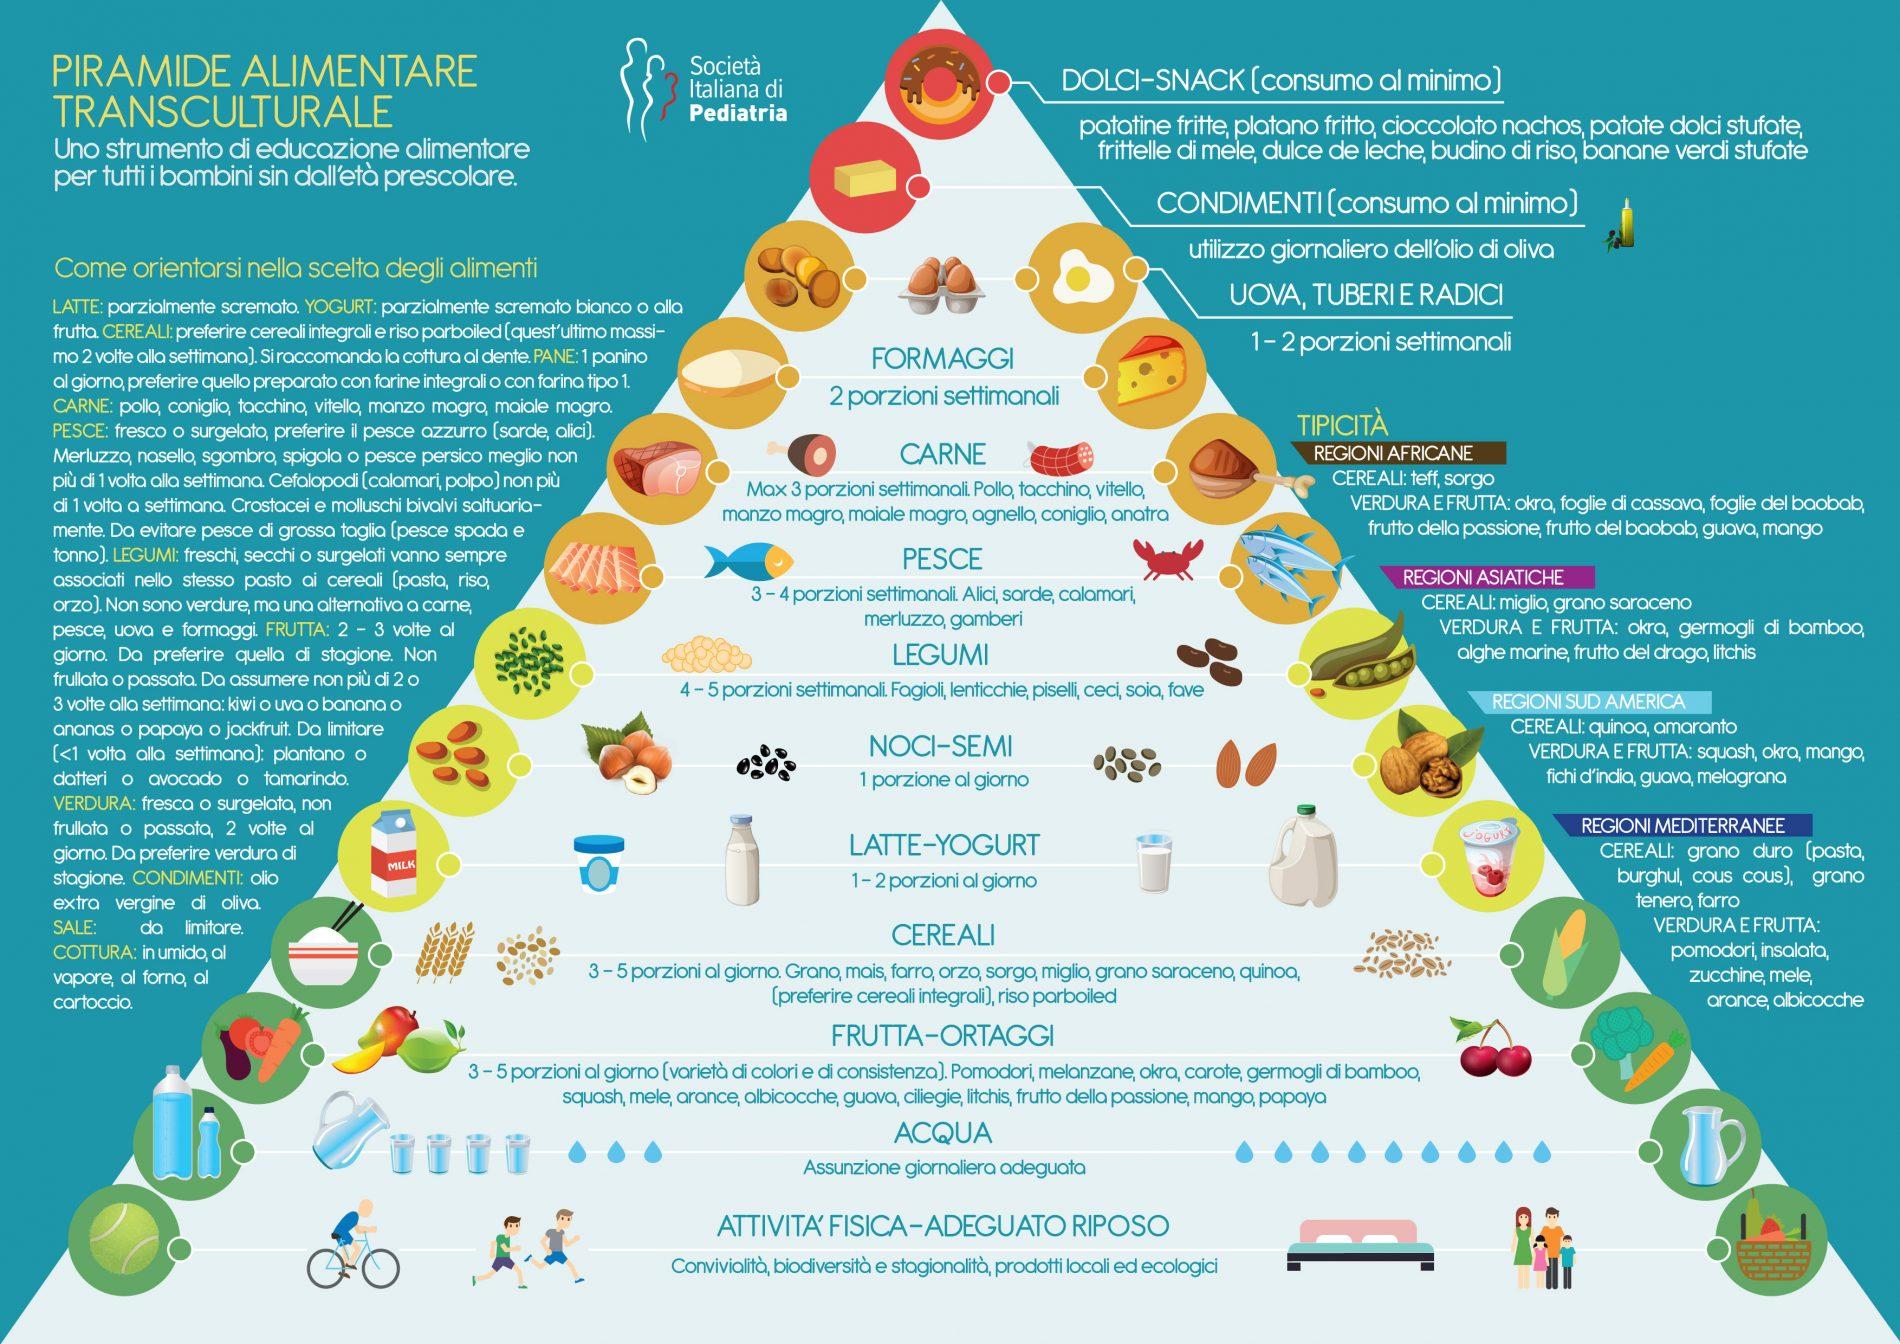 Pirámide alimenticia transcultural SIP